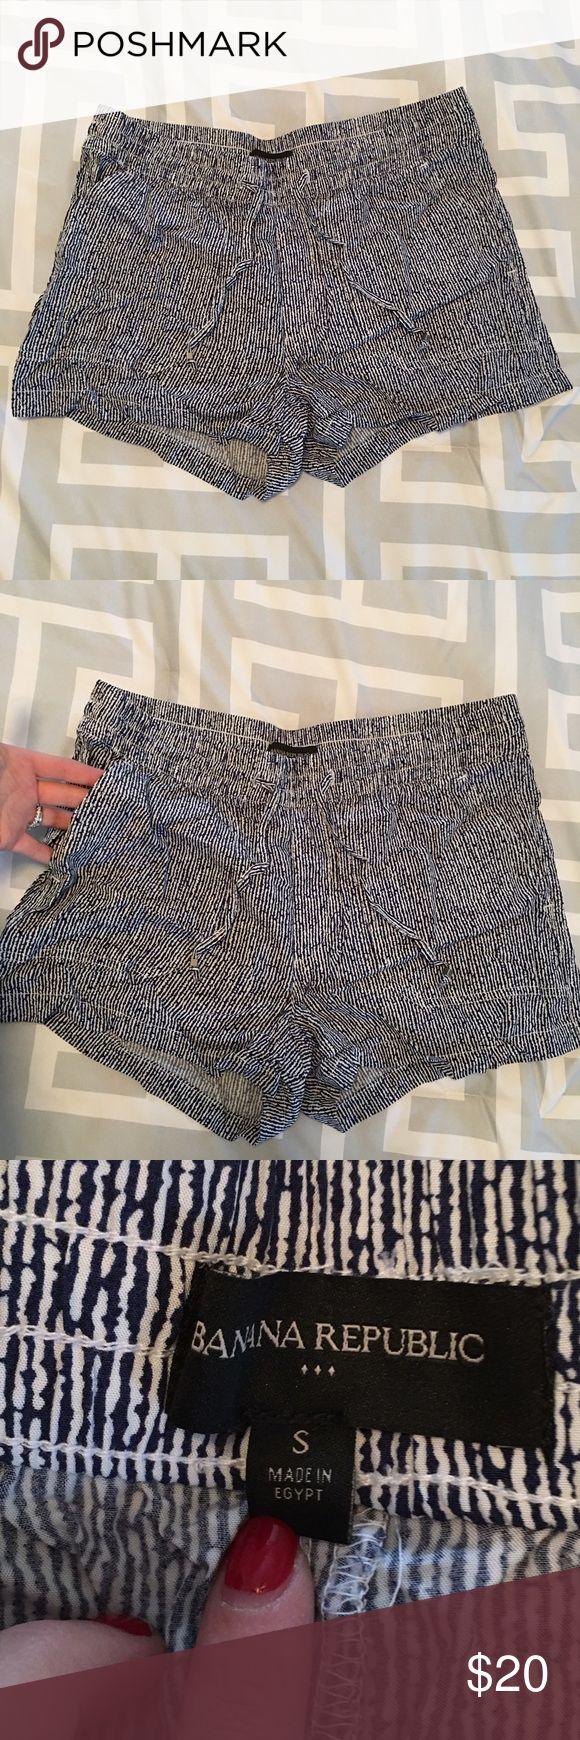 • banana republic shorts • Worn once size small banana republic shorts. In perfect condition   ❌No trades 🚫🚬 Non smoking home 📬 Same/next day shipping Banana Republic Shorts